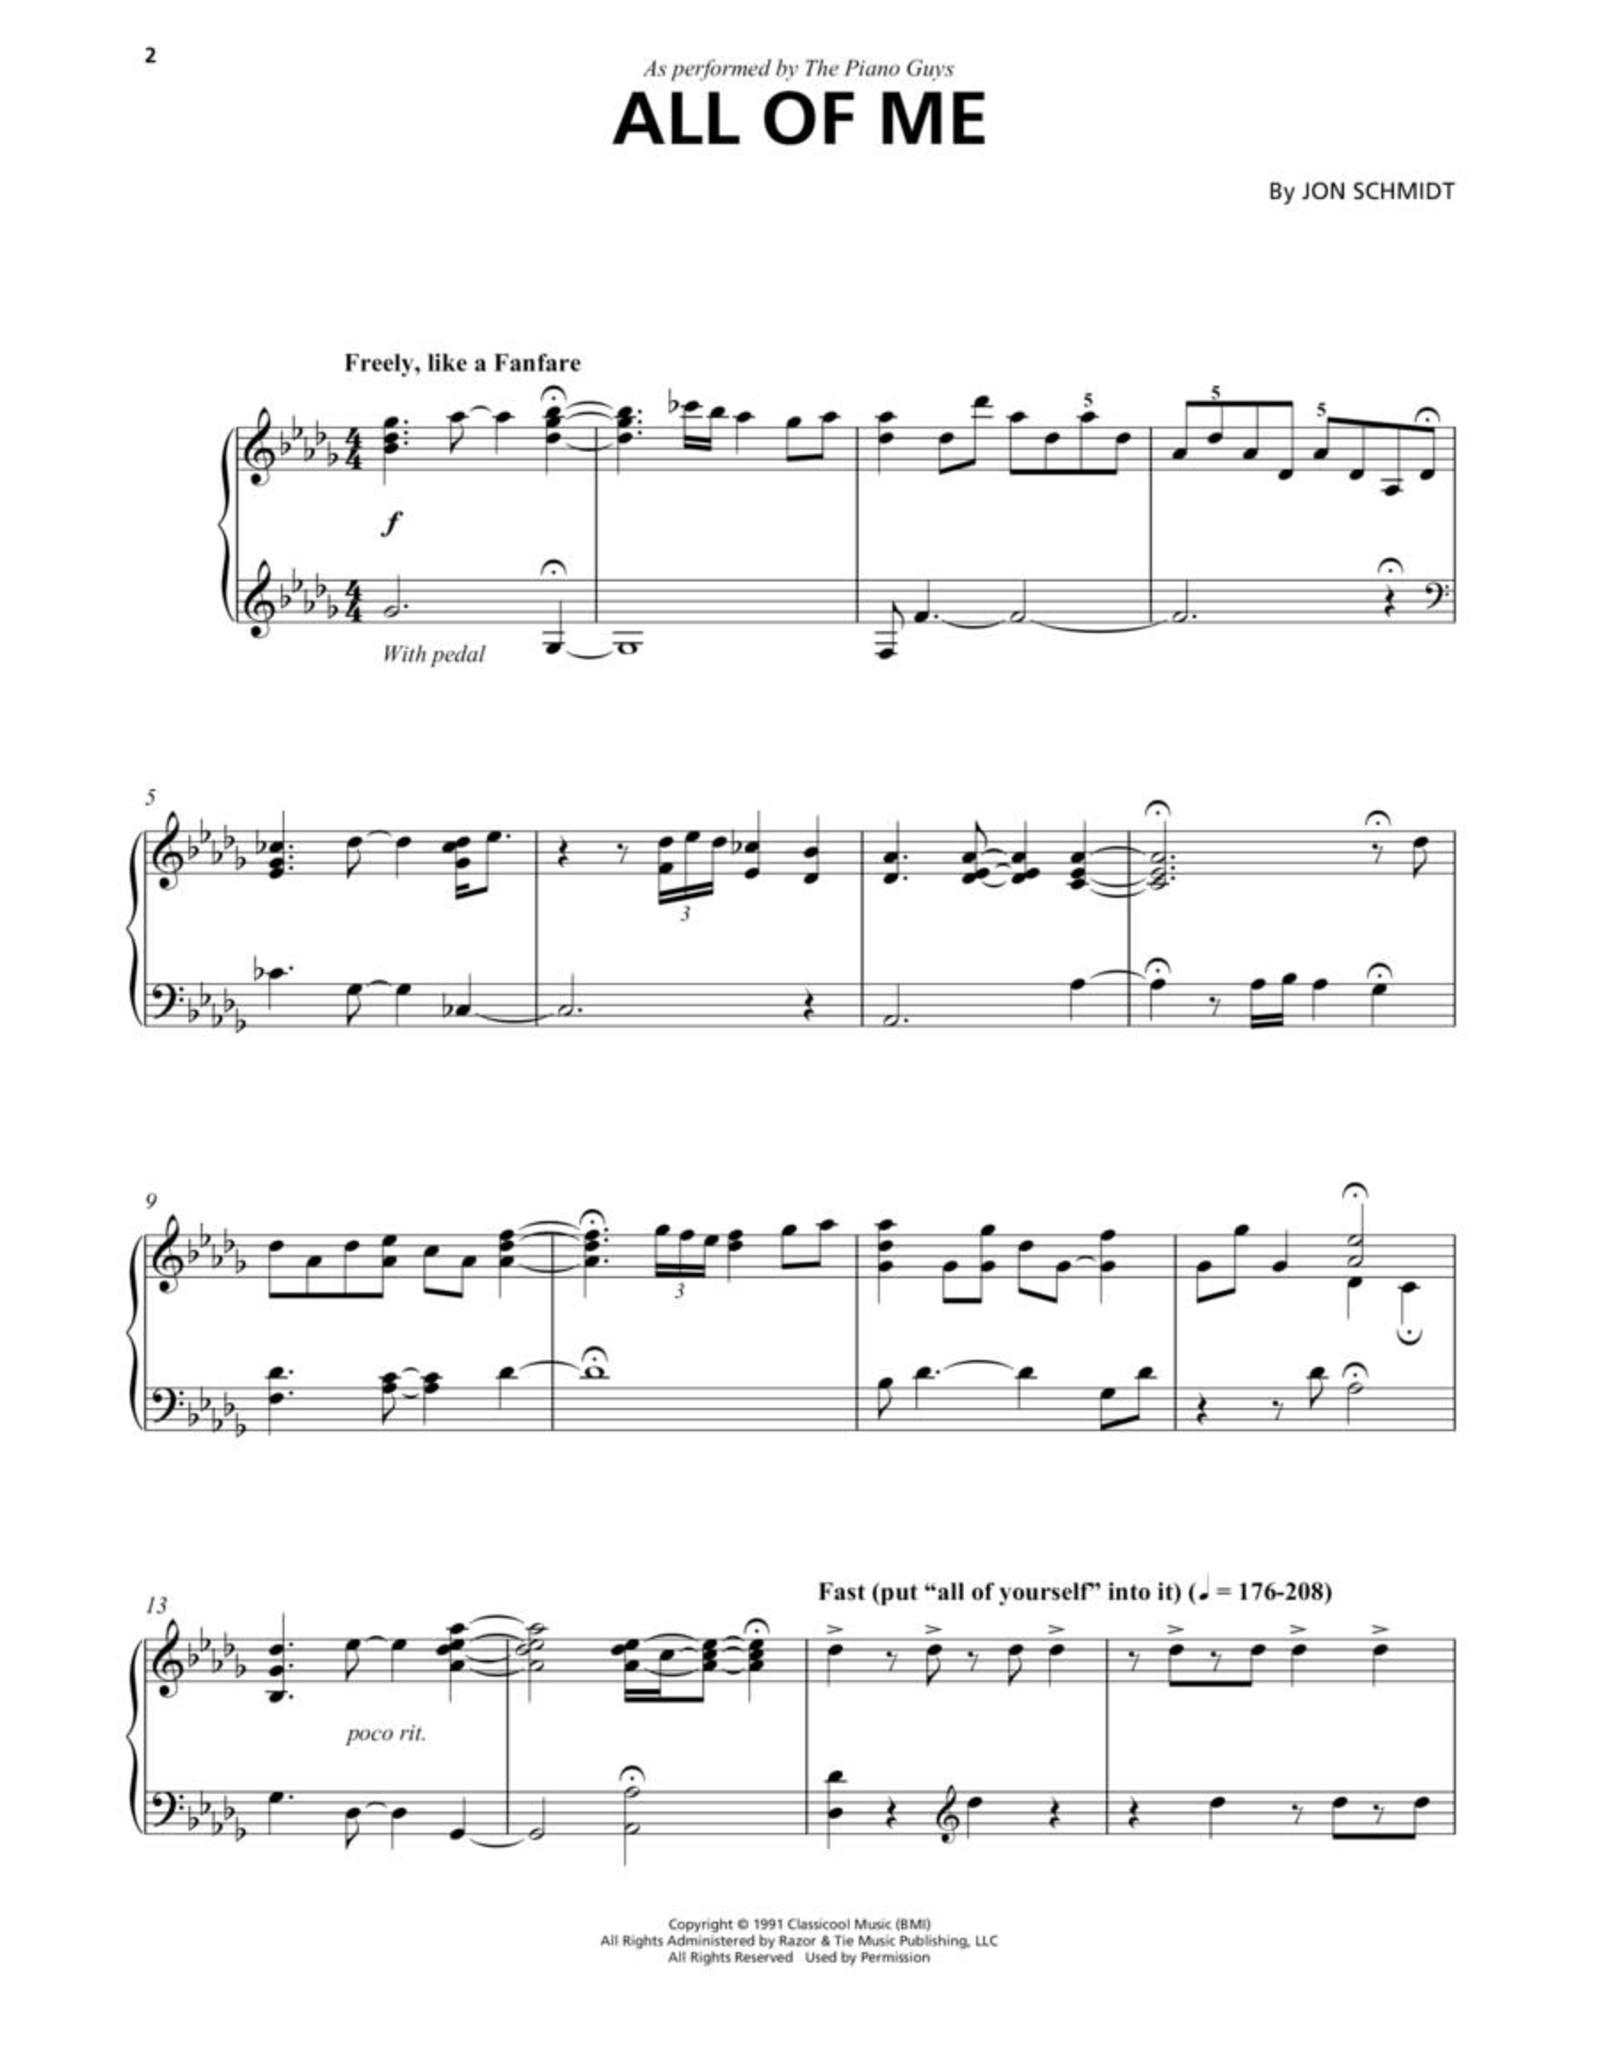 Hal Leonard Piano Guys - Piano Solo with Optional Cello